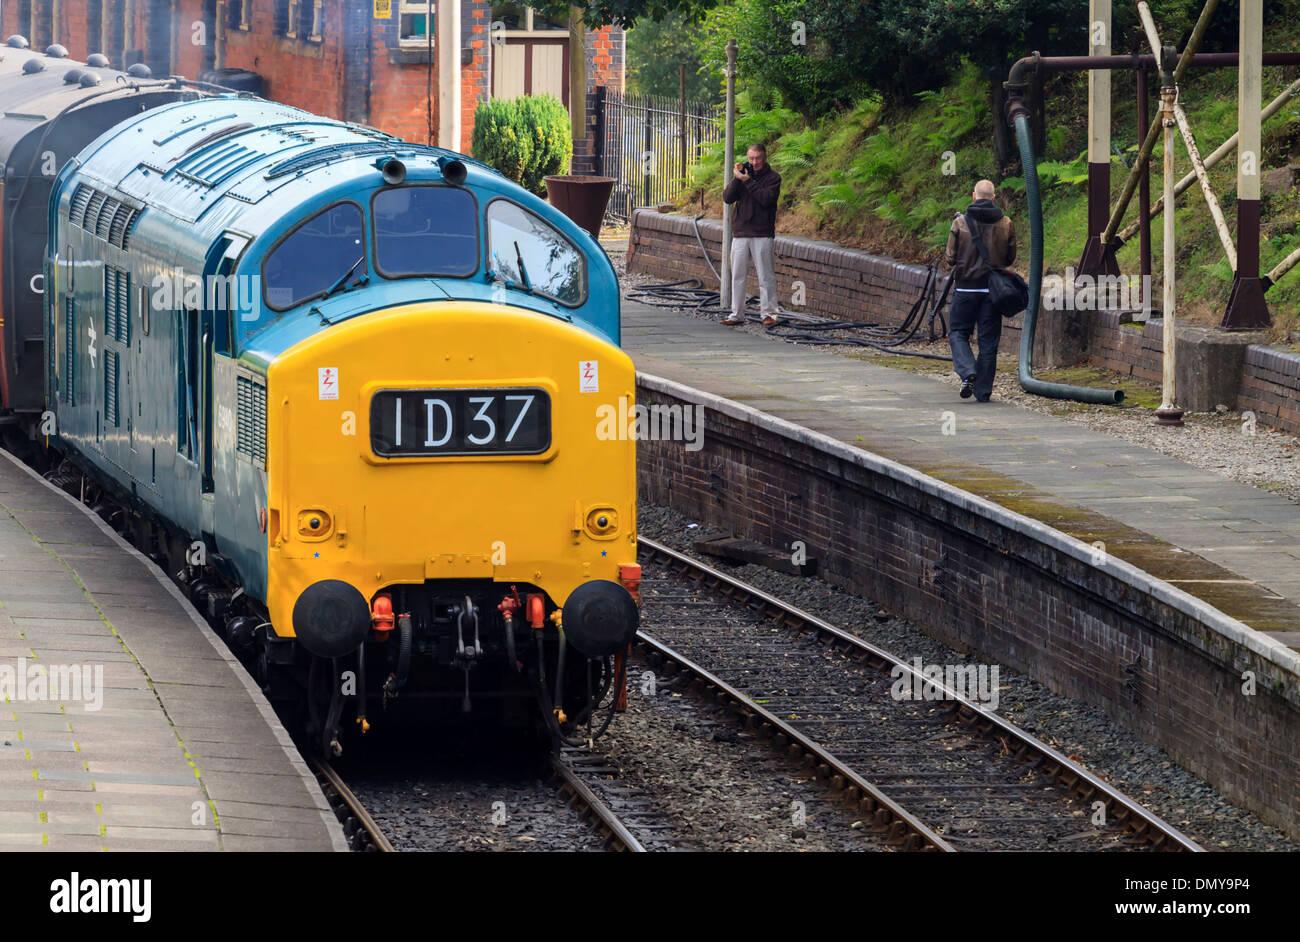 Class 37 (37240/D6940) is seen running on the Llangollen Heritage Railway  during Diesel Day.